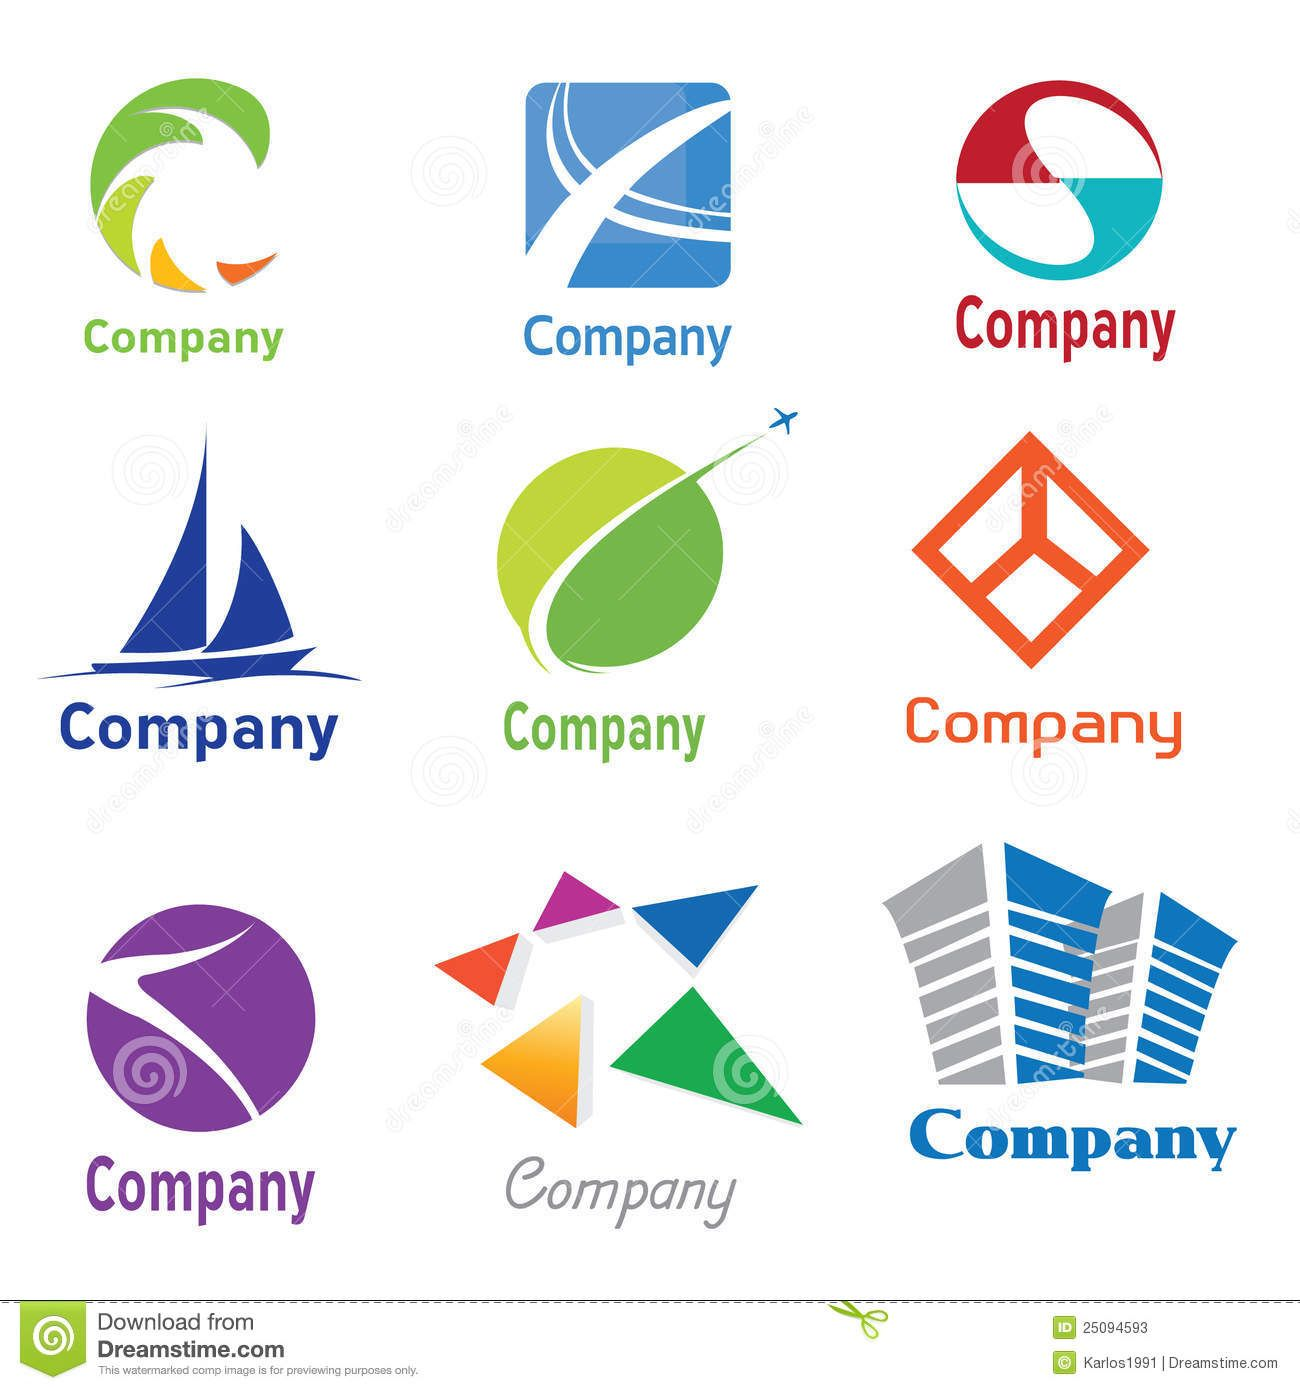 company logo samples free download juve cenitdelacabrera co